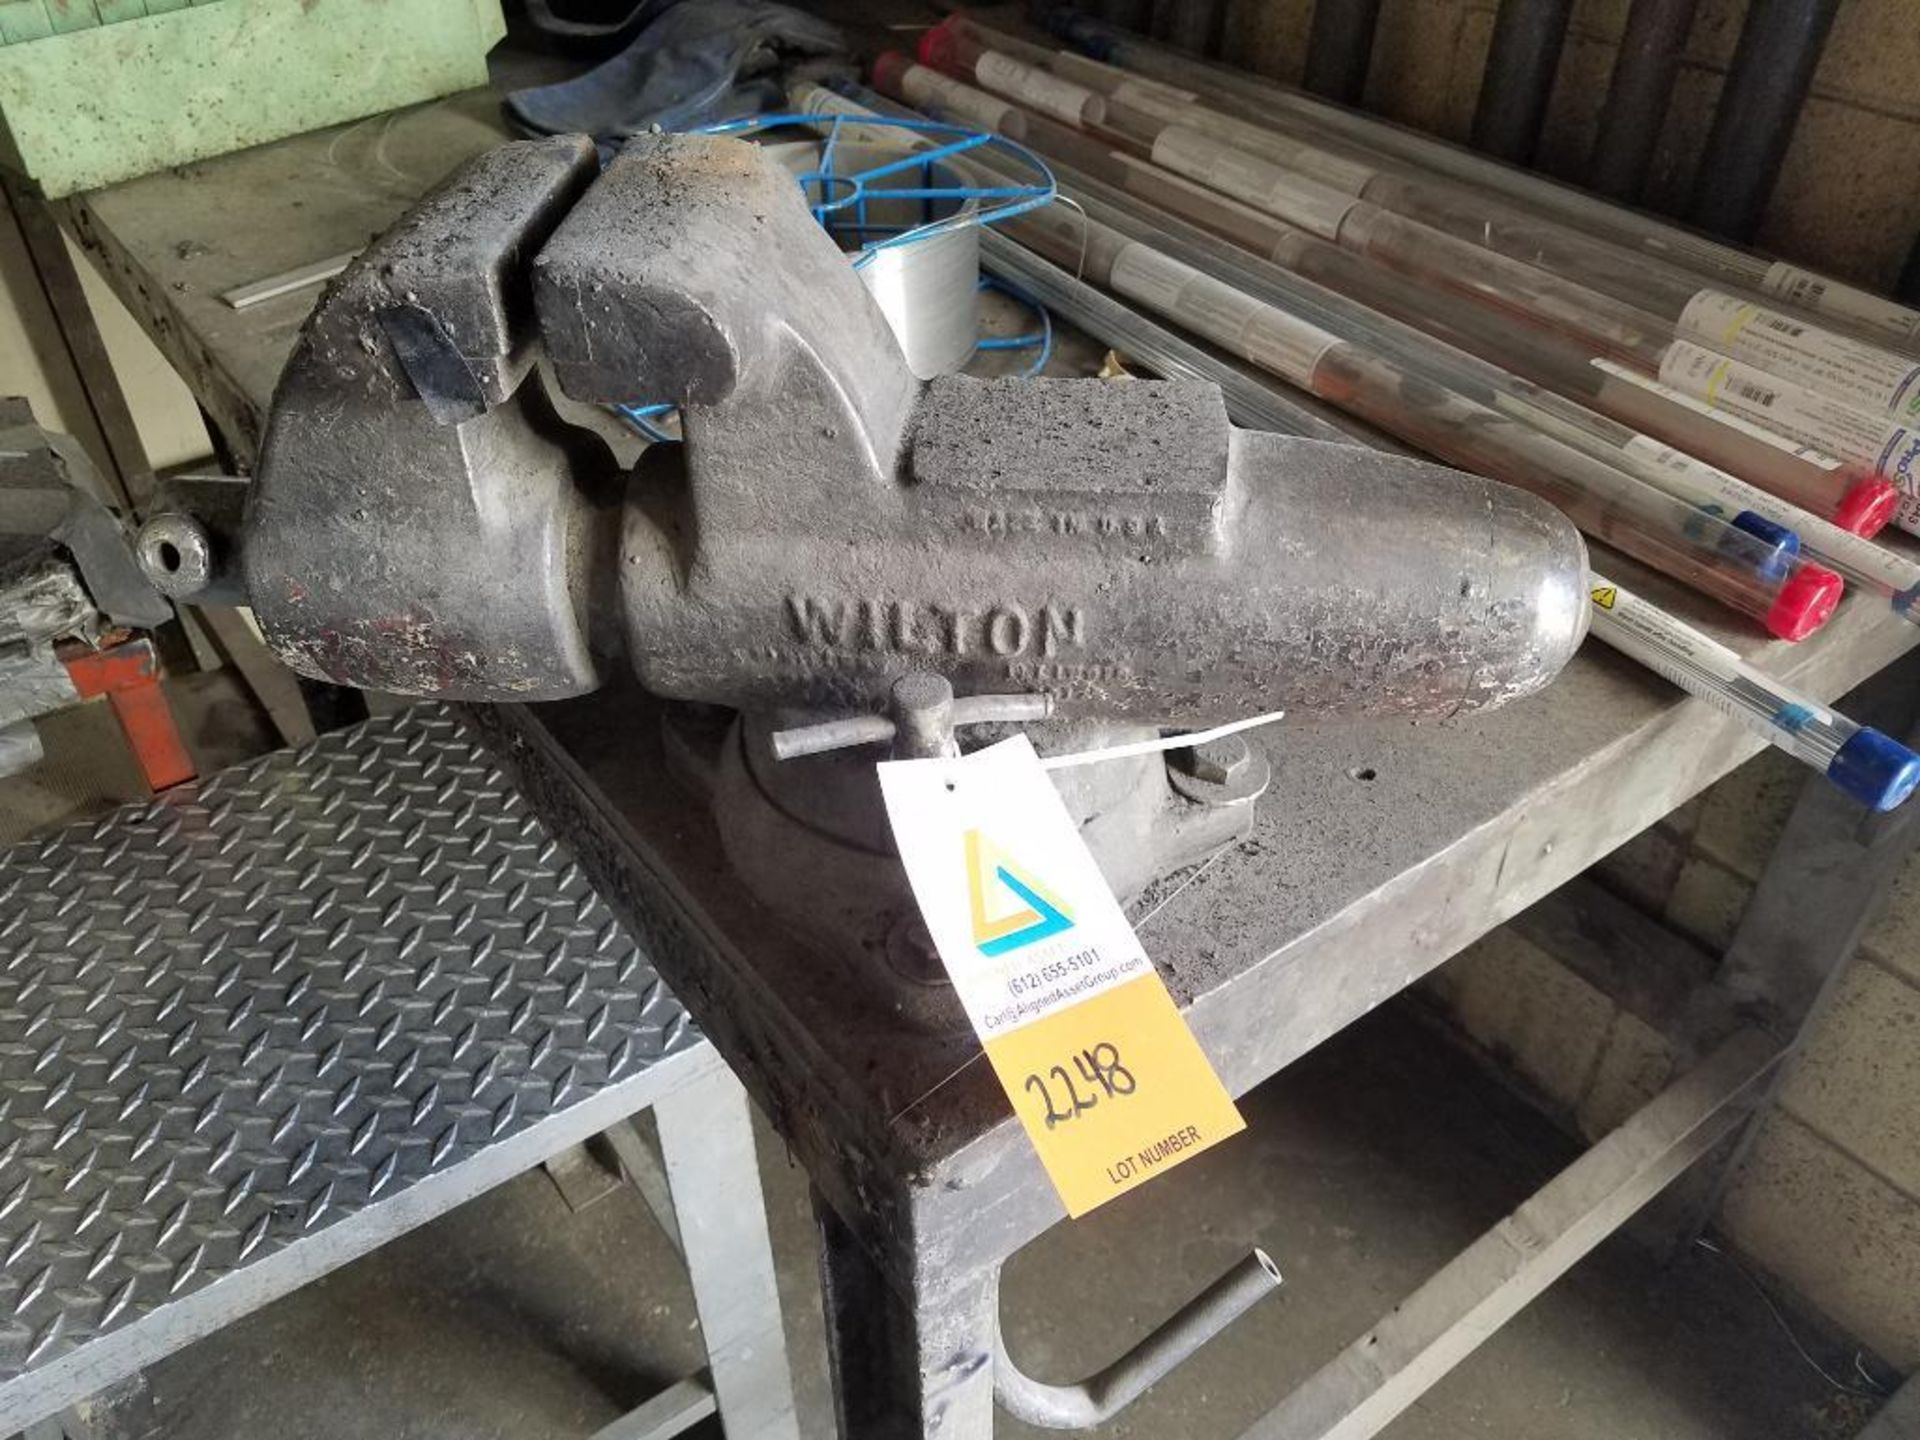 steel welding table - Image 2 of 2